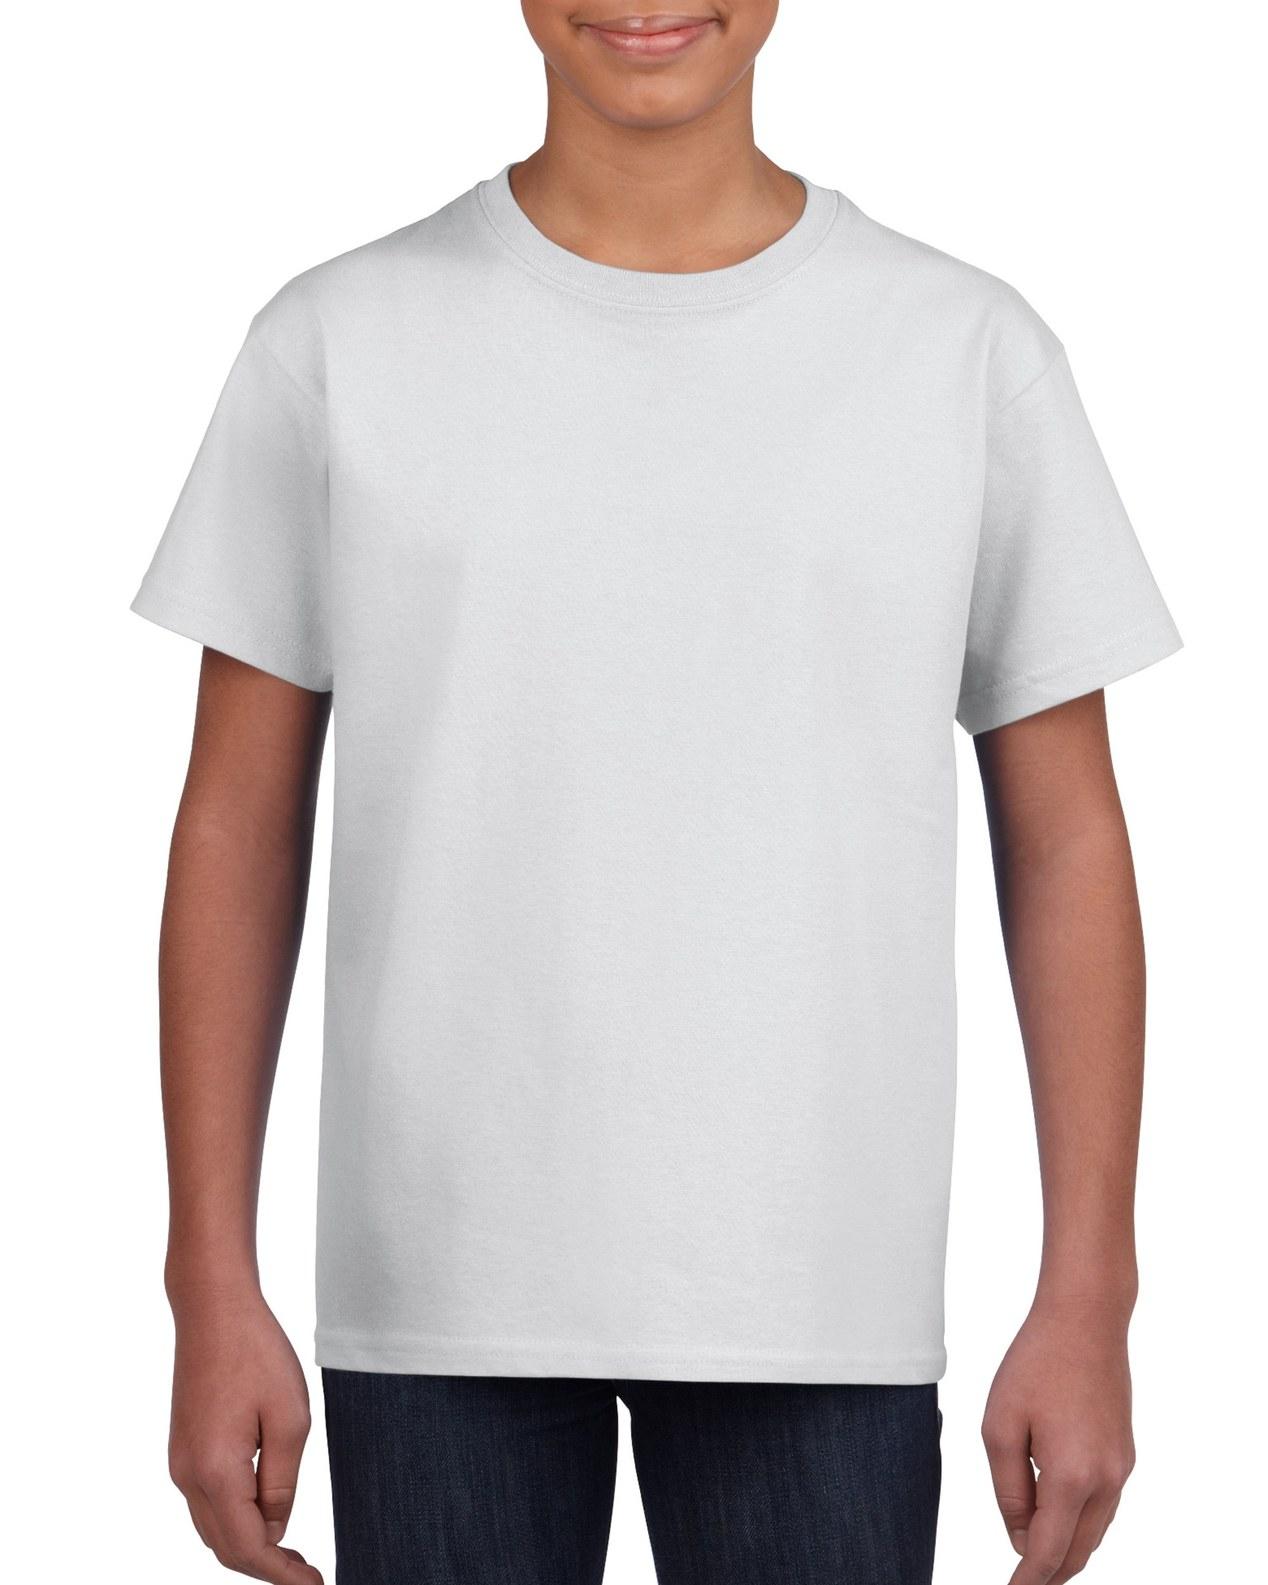 3fc93c88ff2 Gildan Ultra Cotton Youth T Shirt